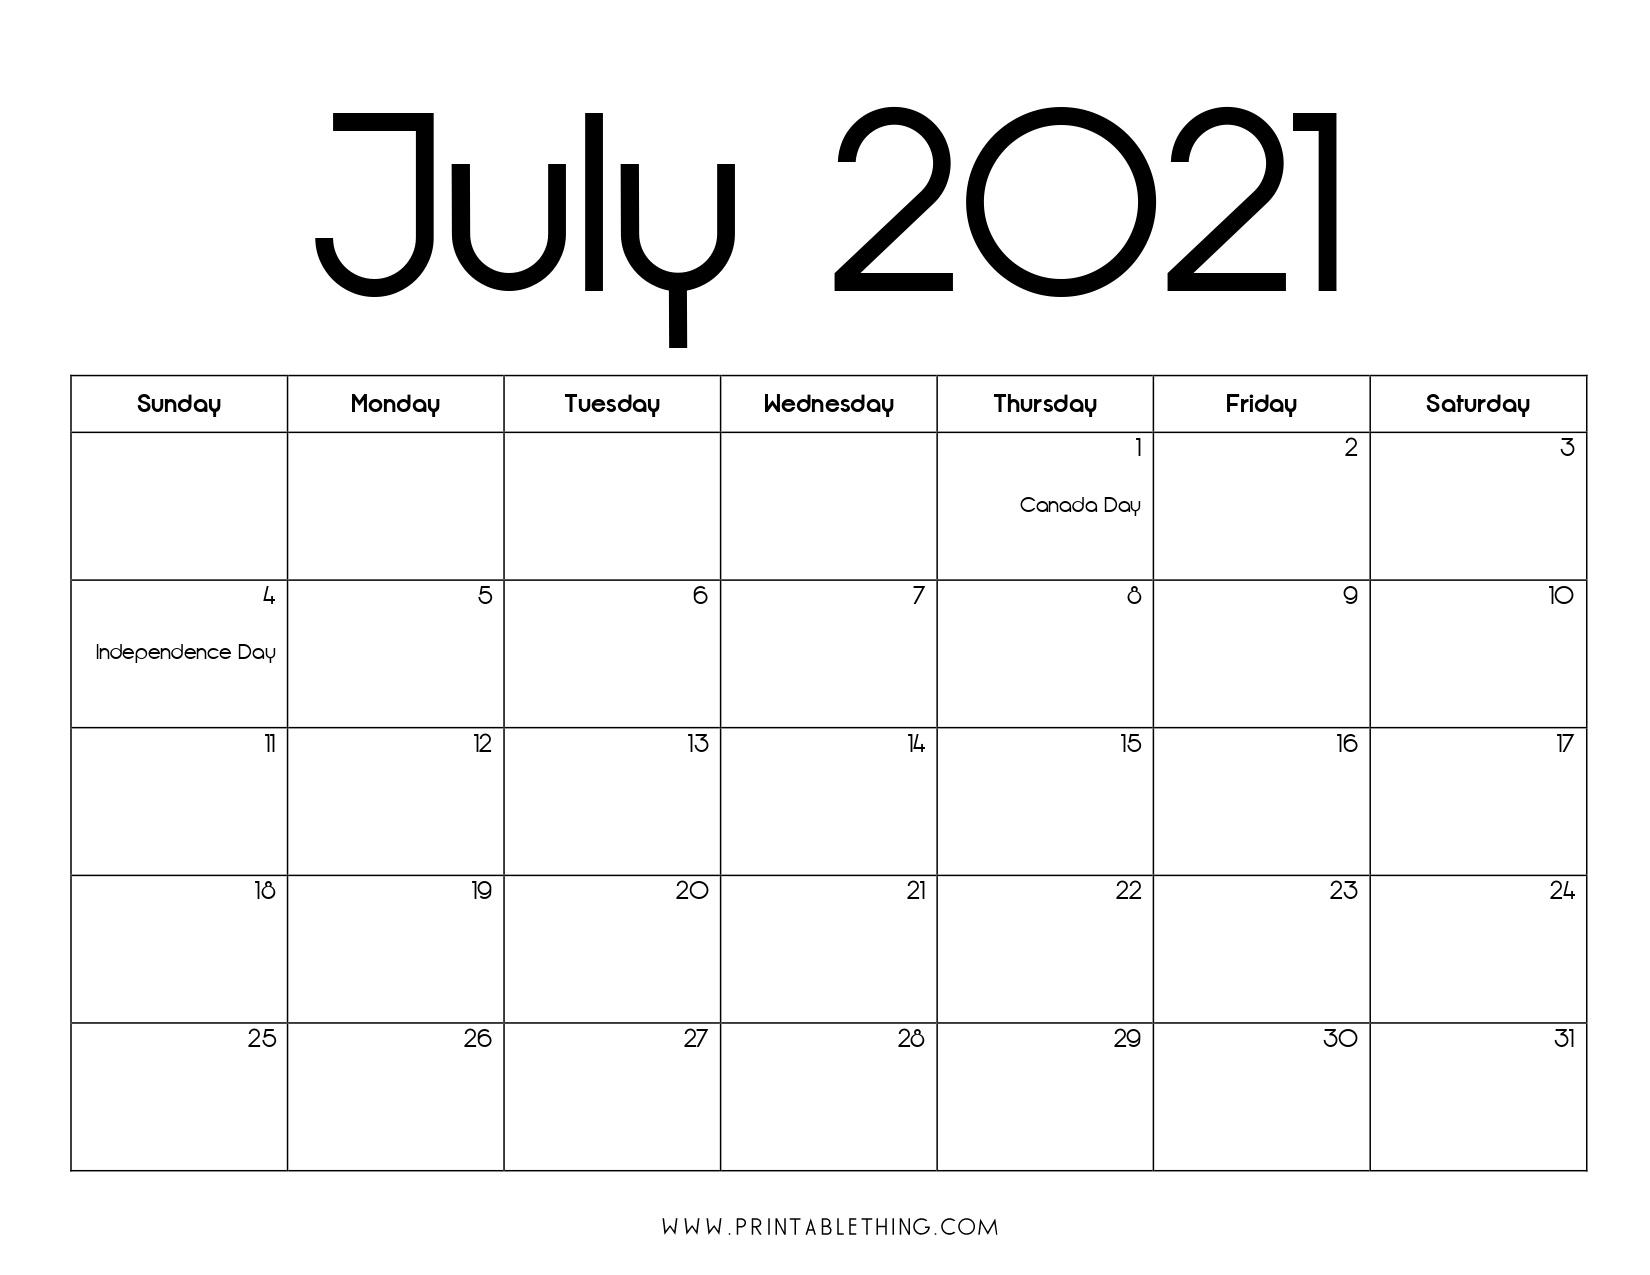 July 2021 Calendar Pdf, July 2021 Calendar Image, Print Pdf & Image Blank July 2021 Calendar Printable